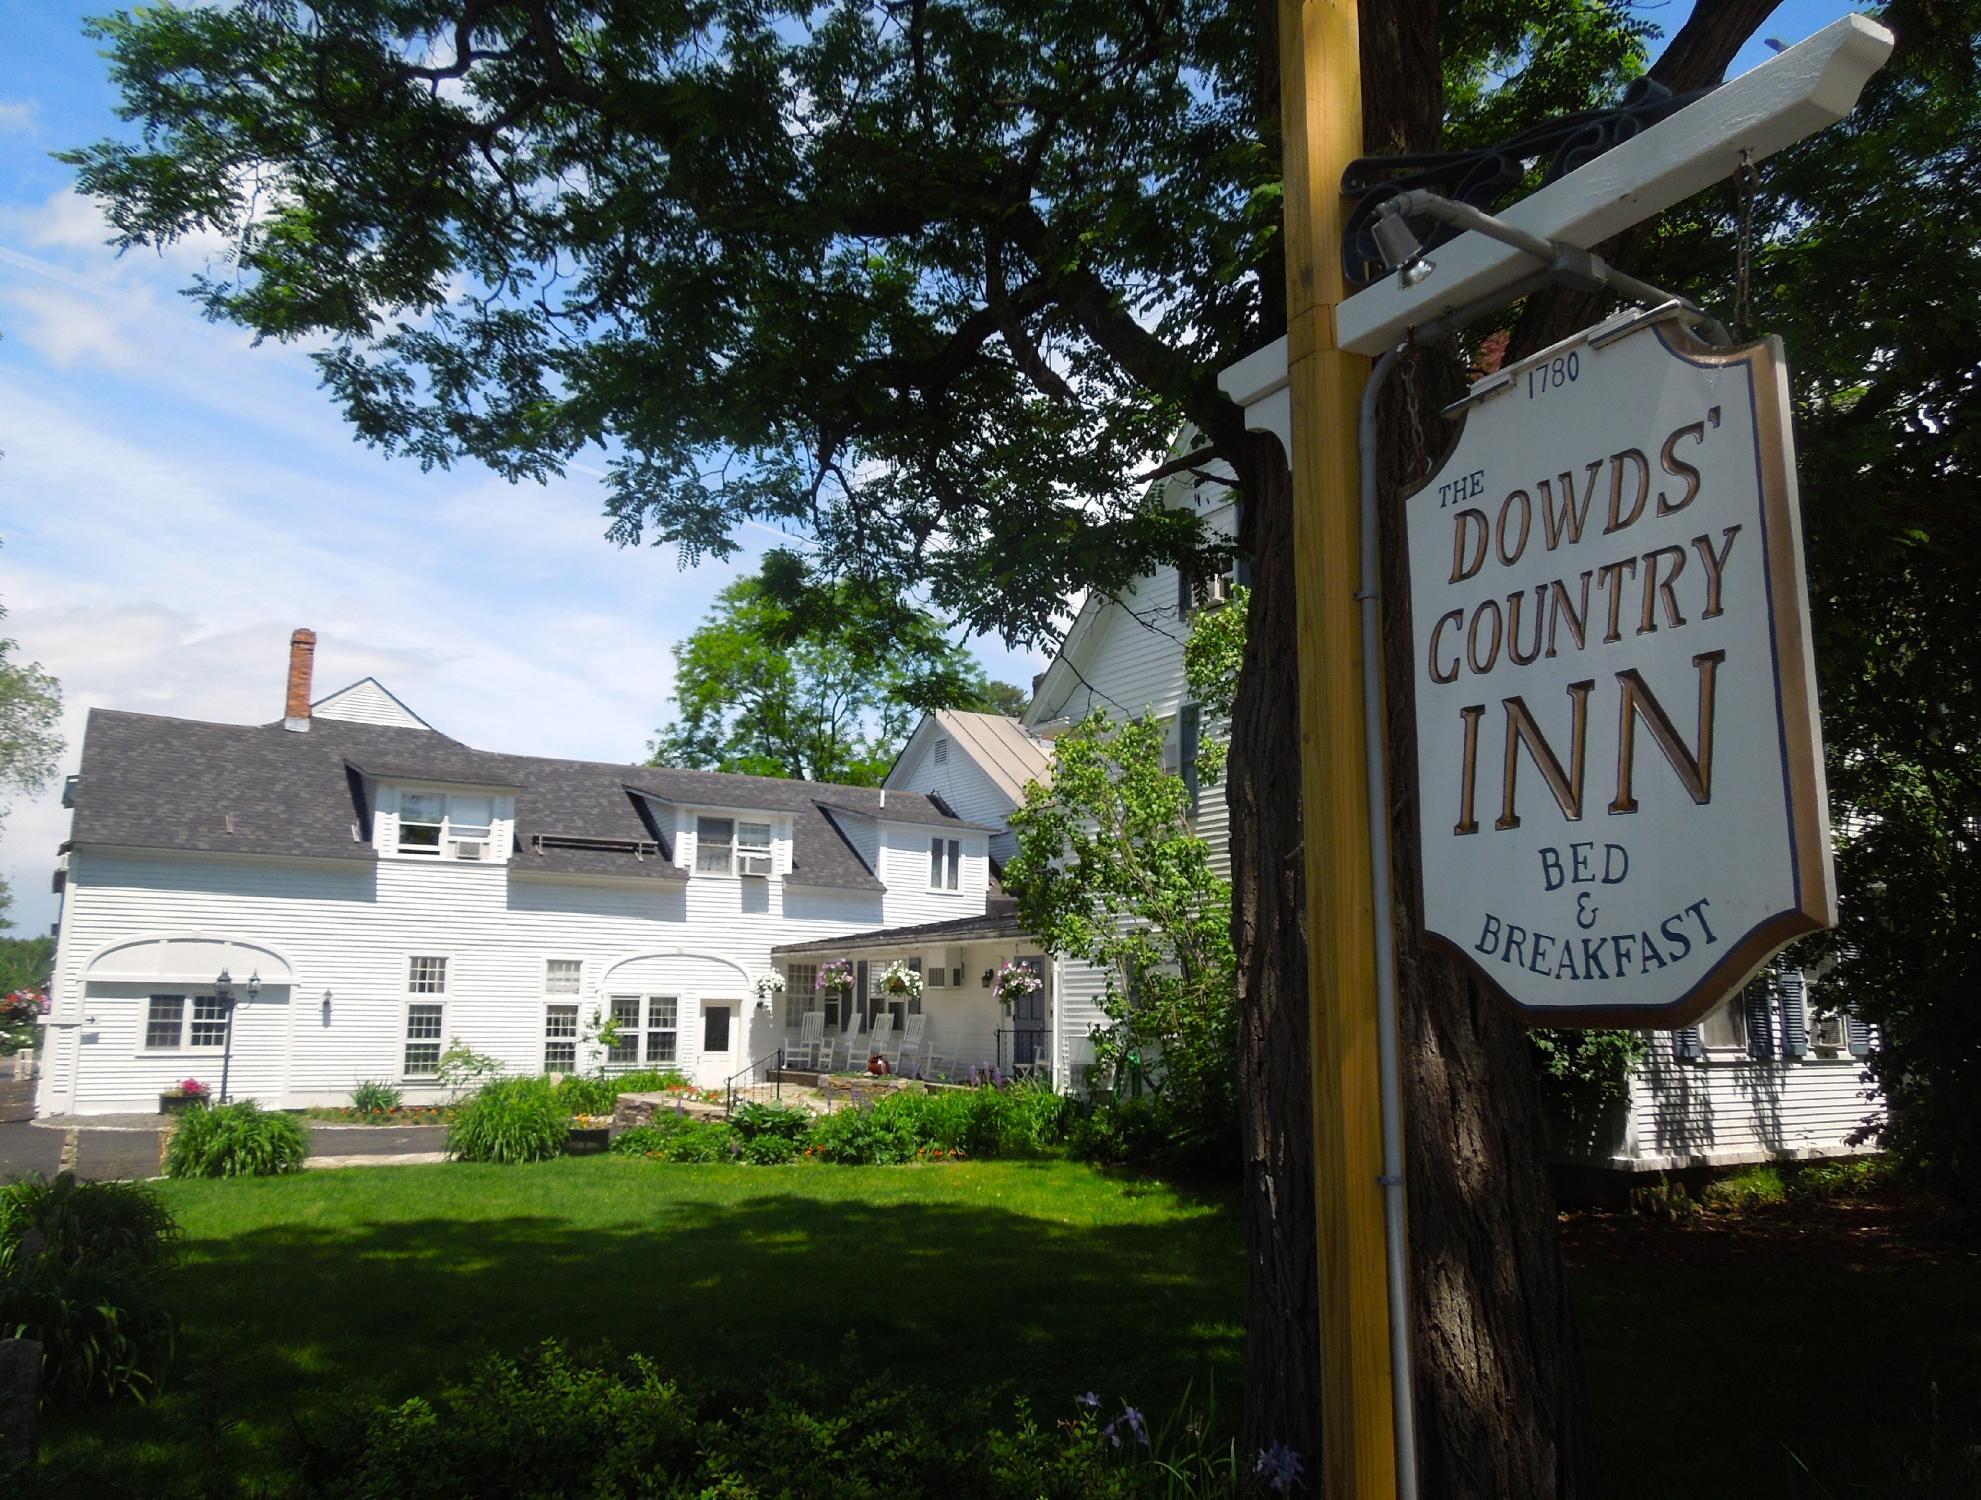 Dowds' Country Inn